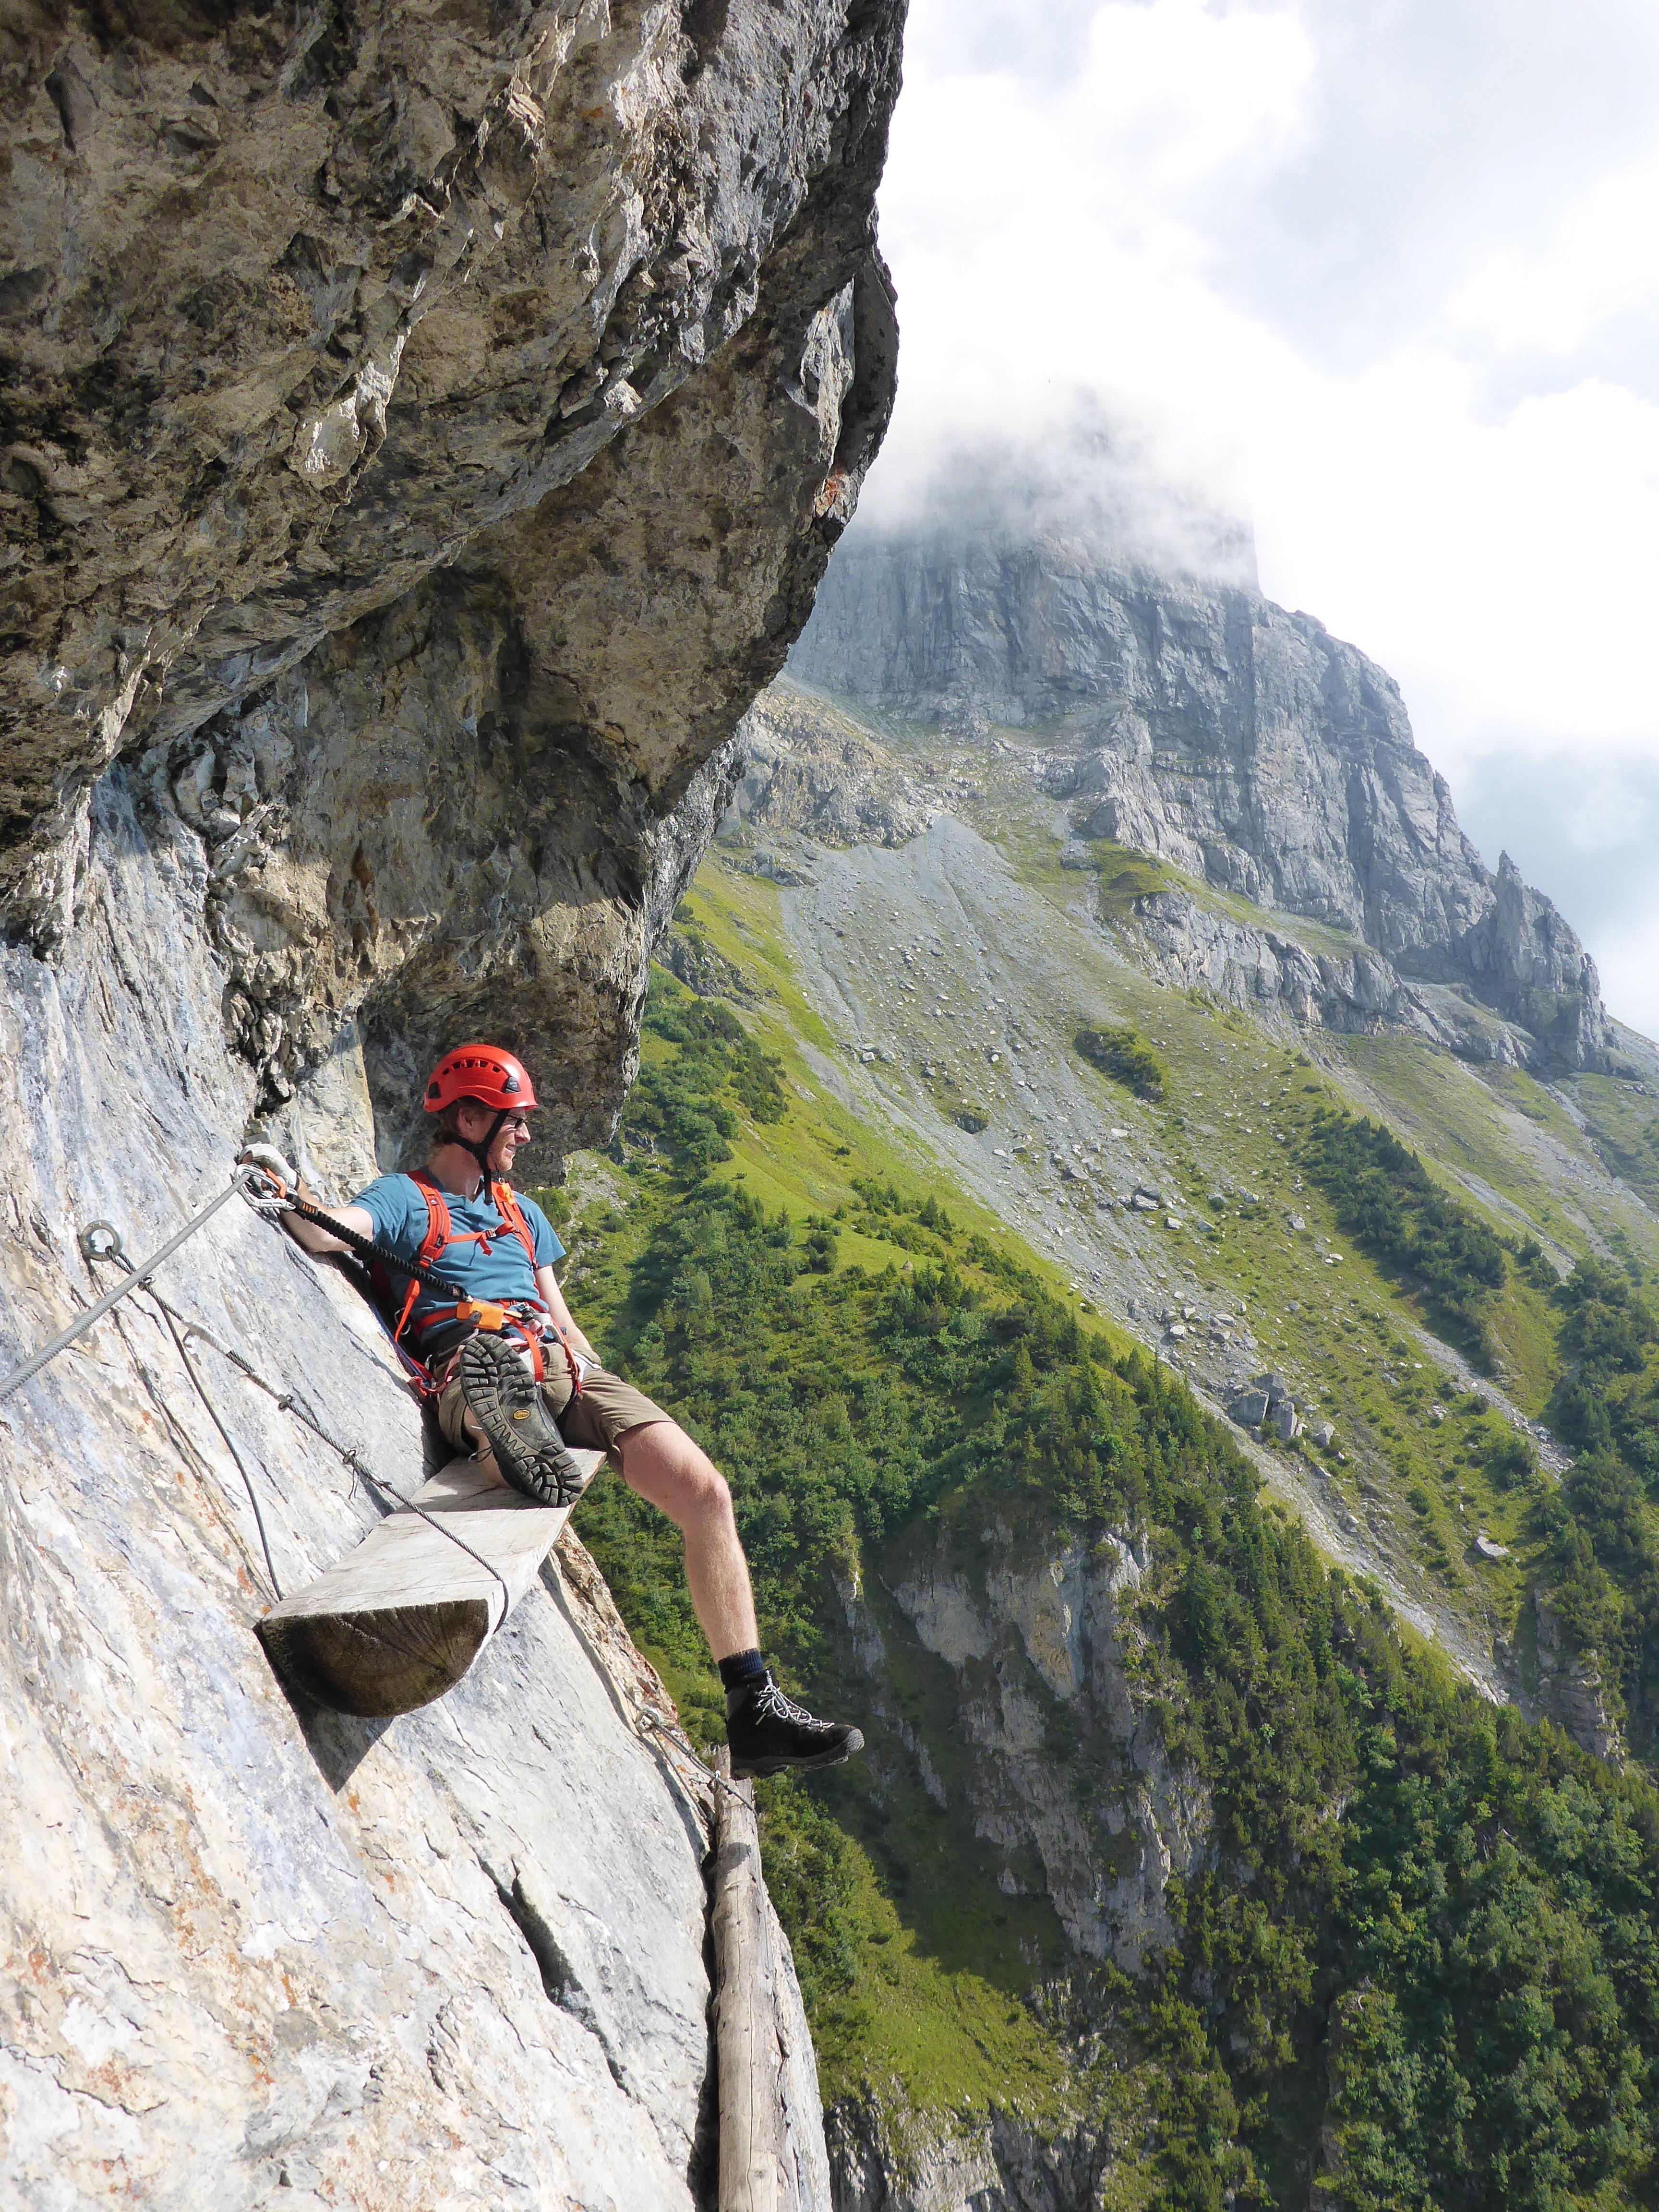 Climber enjoying the views